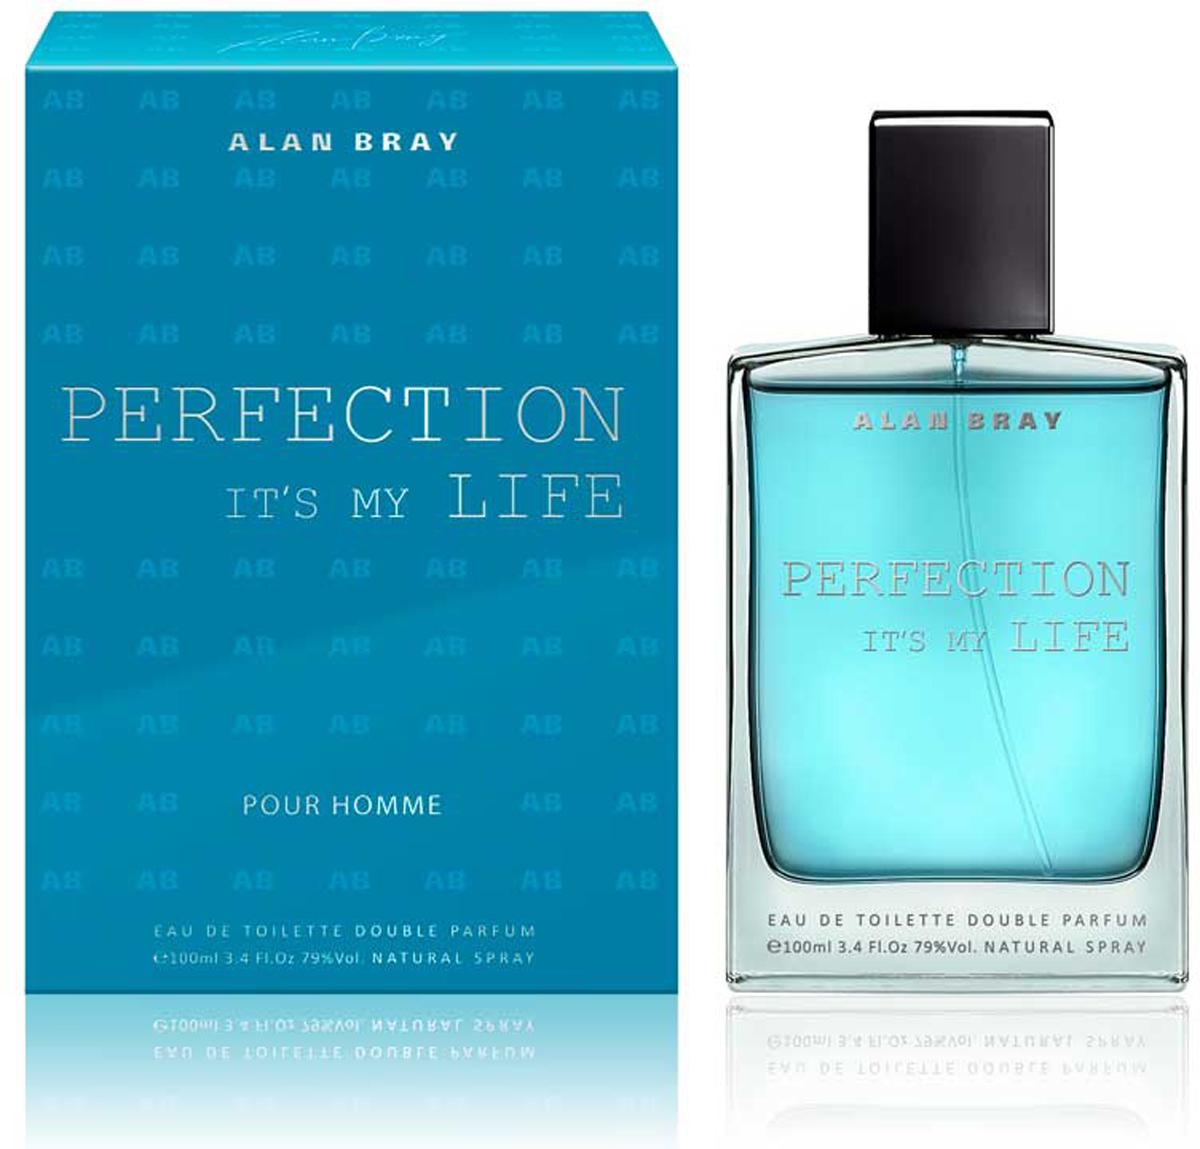 Alan Bray Туалетная вода Perfection, 100 мл